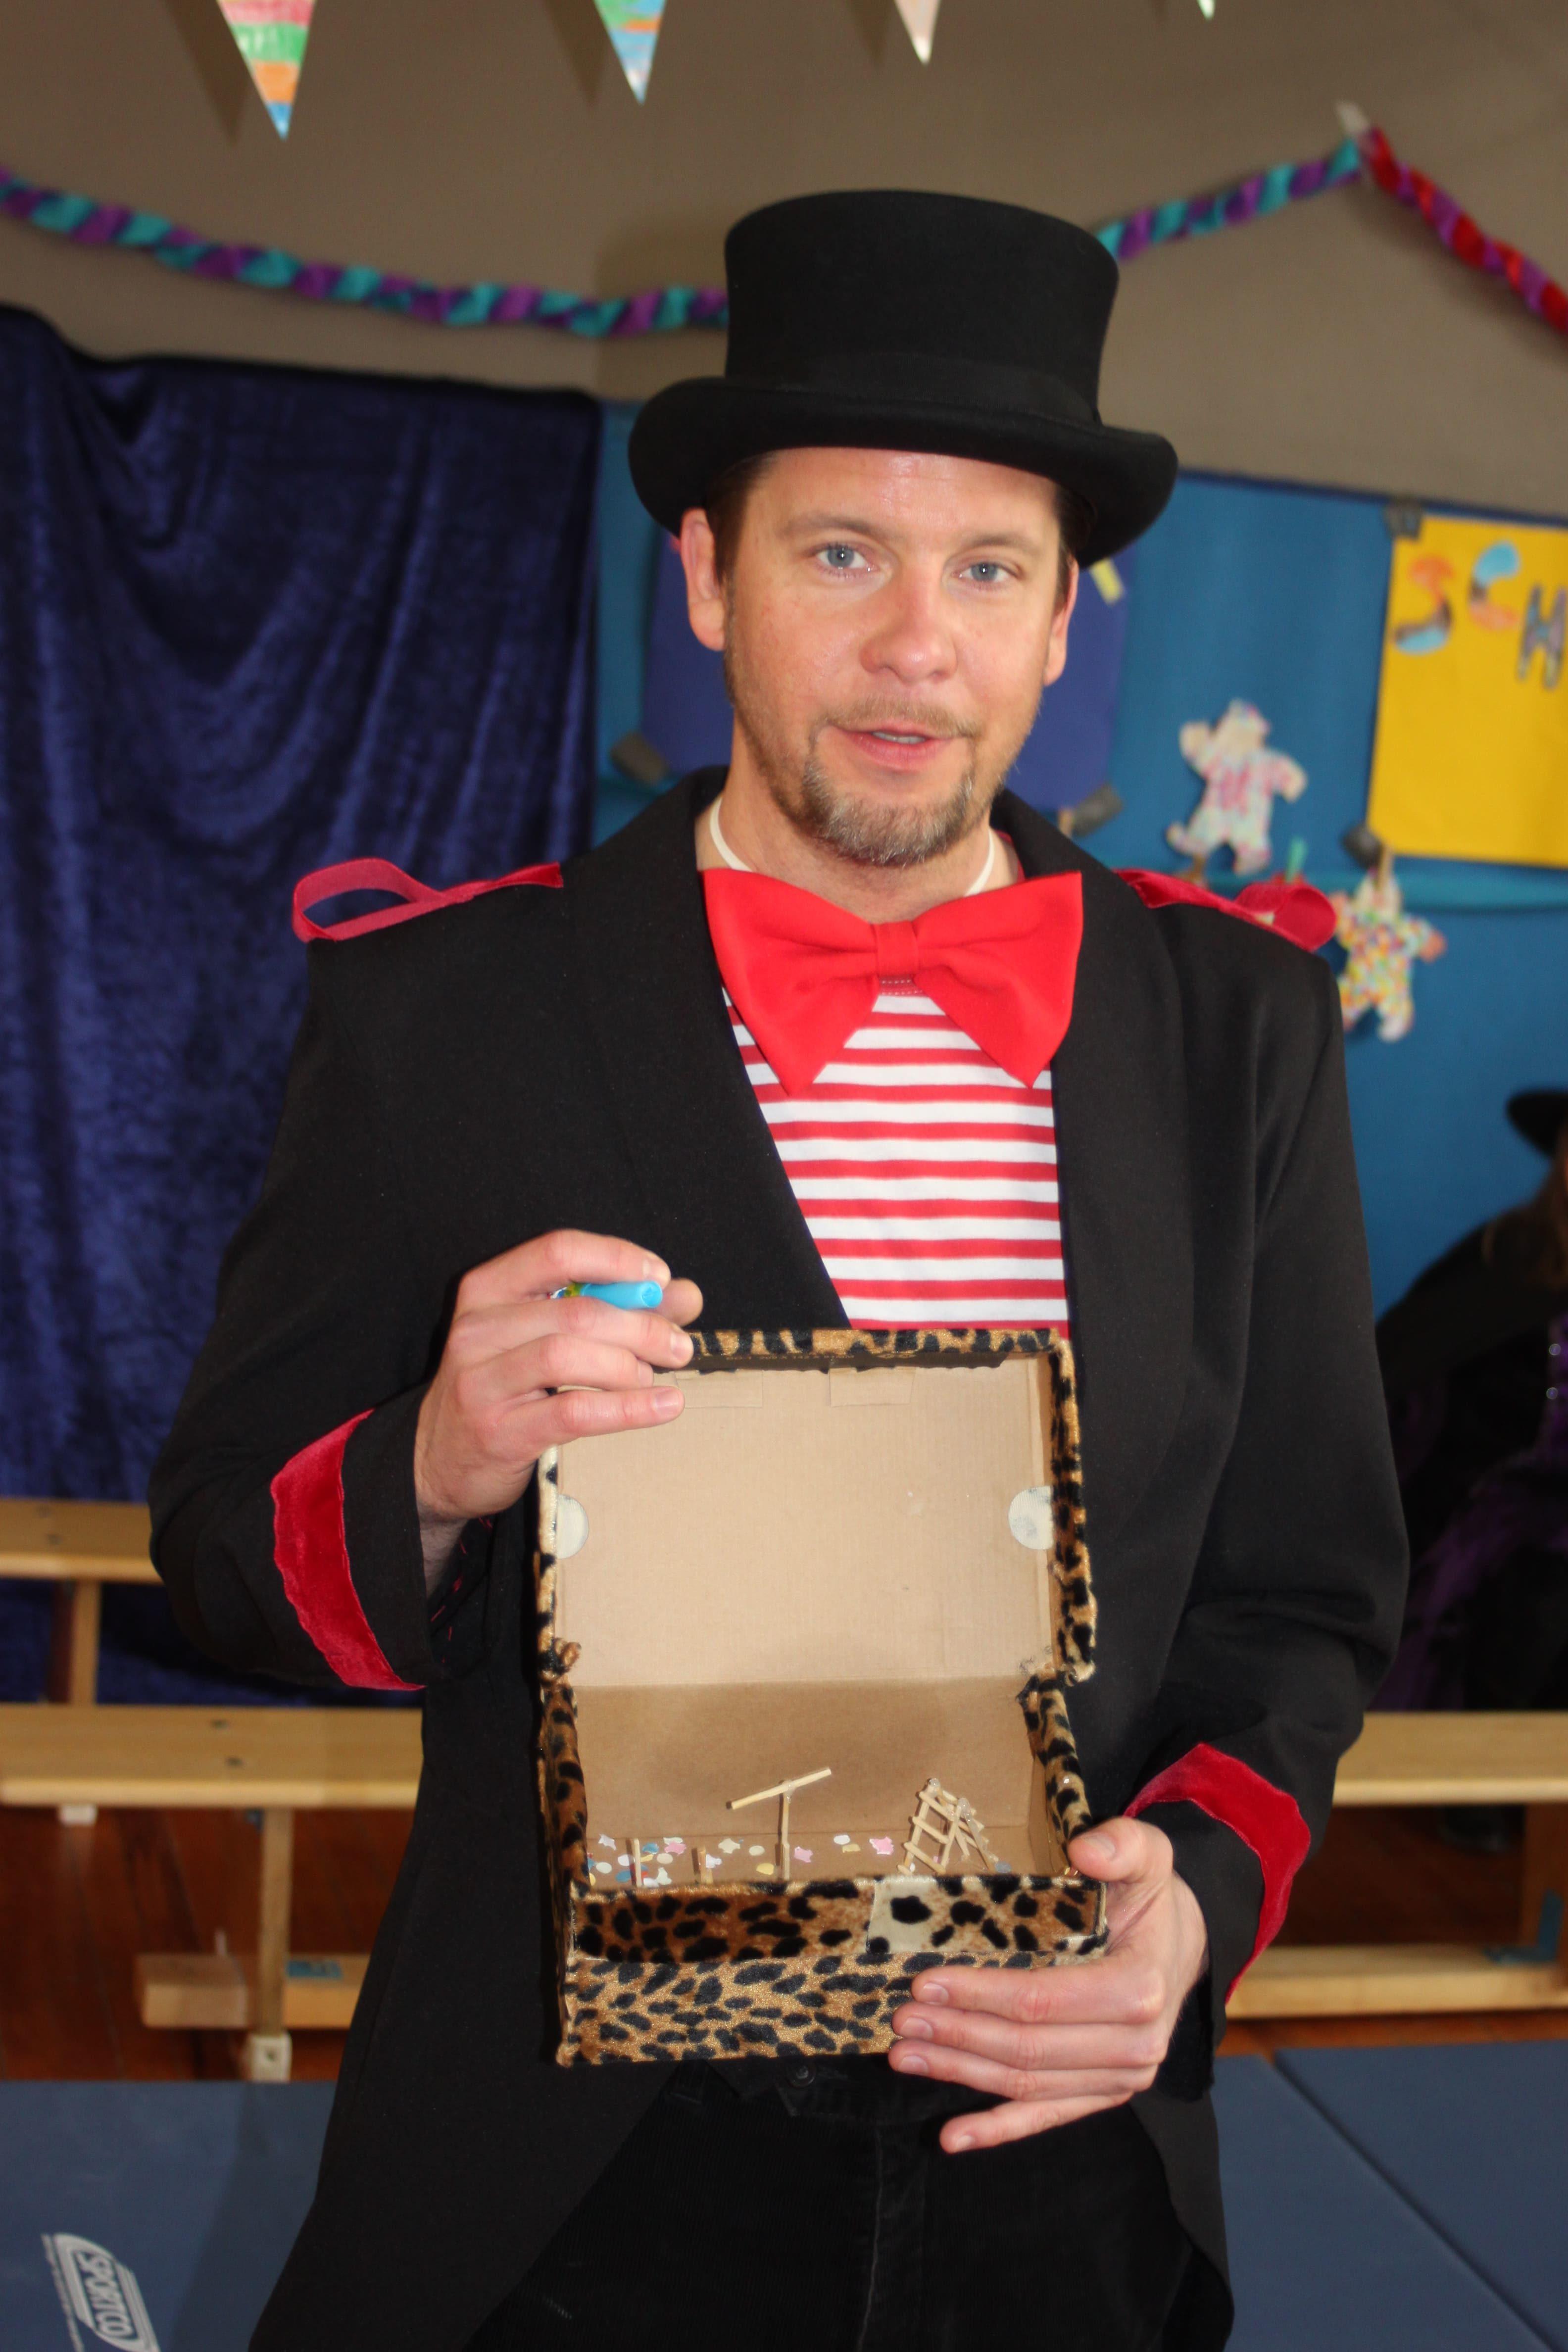 Flohzirkusdirektor Schlieper